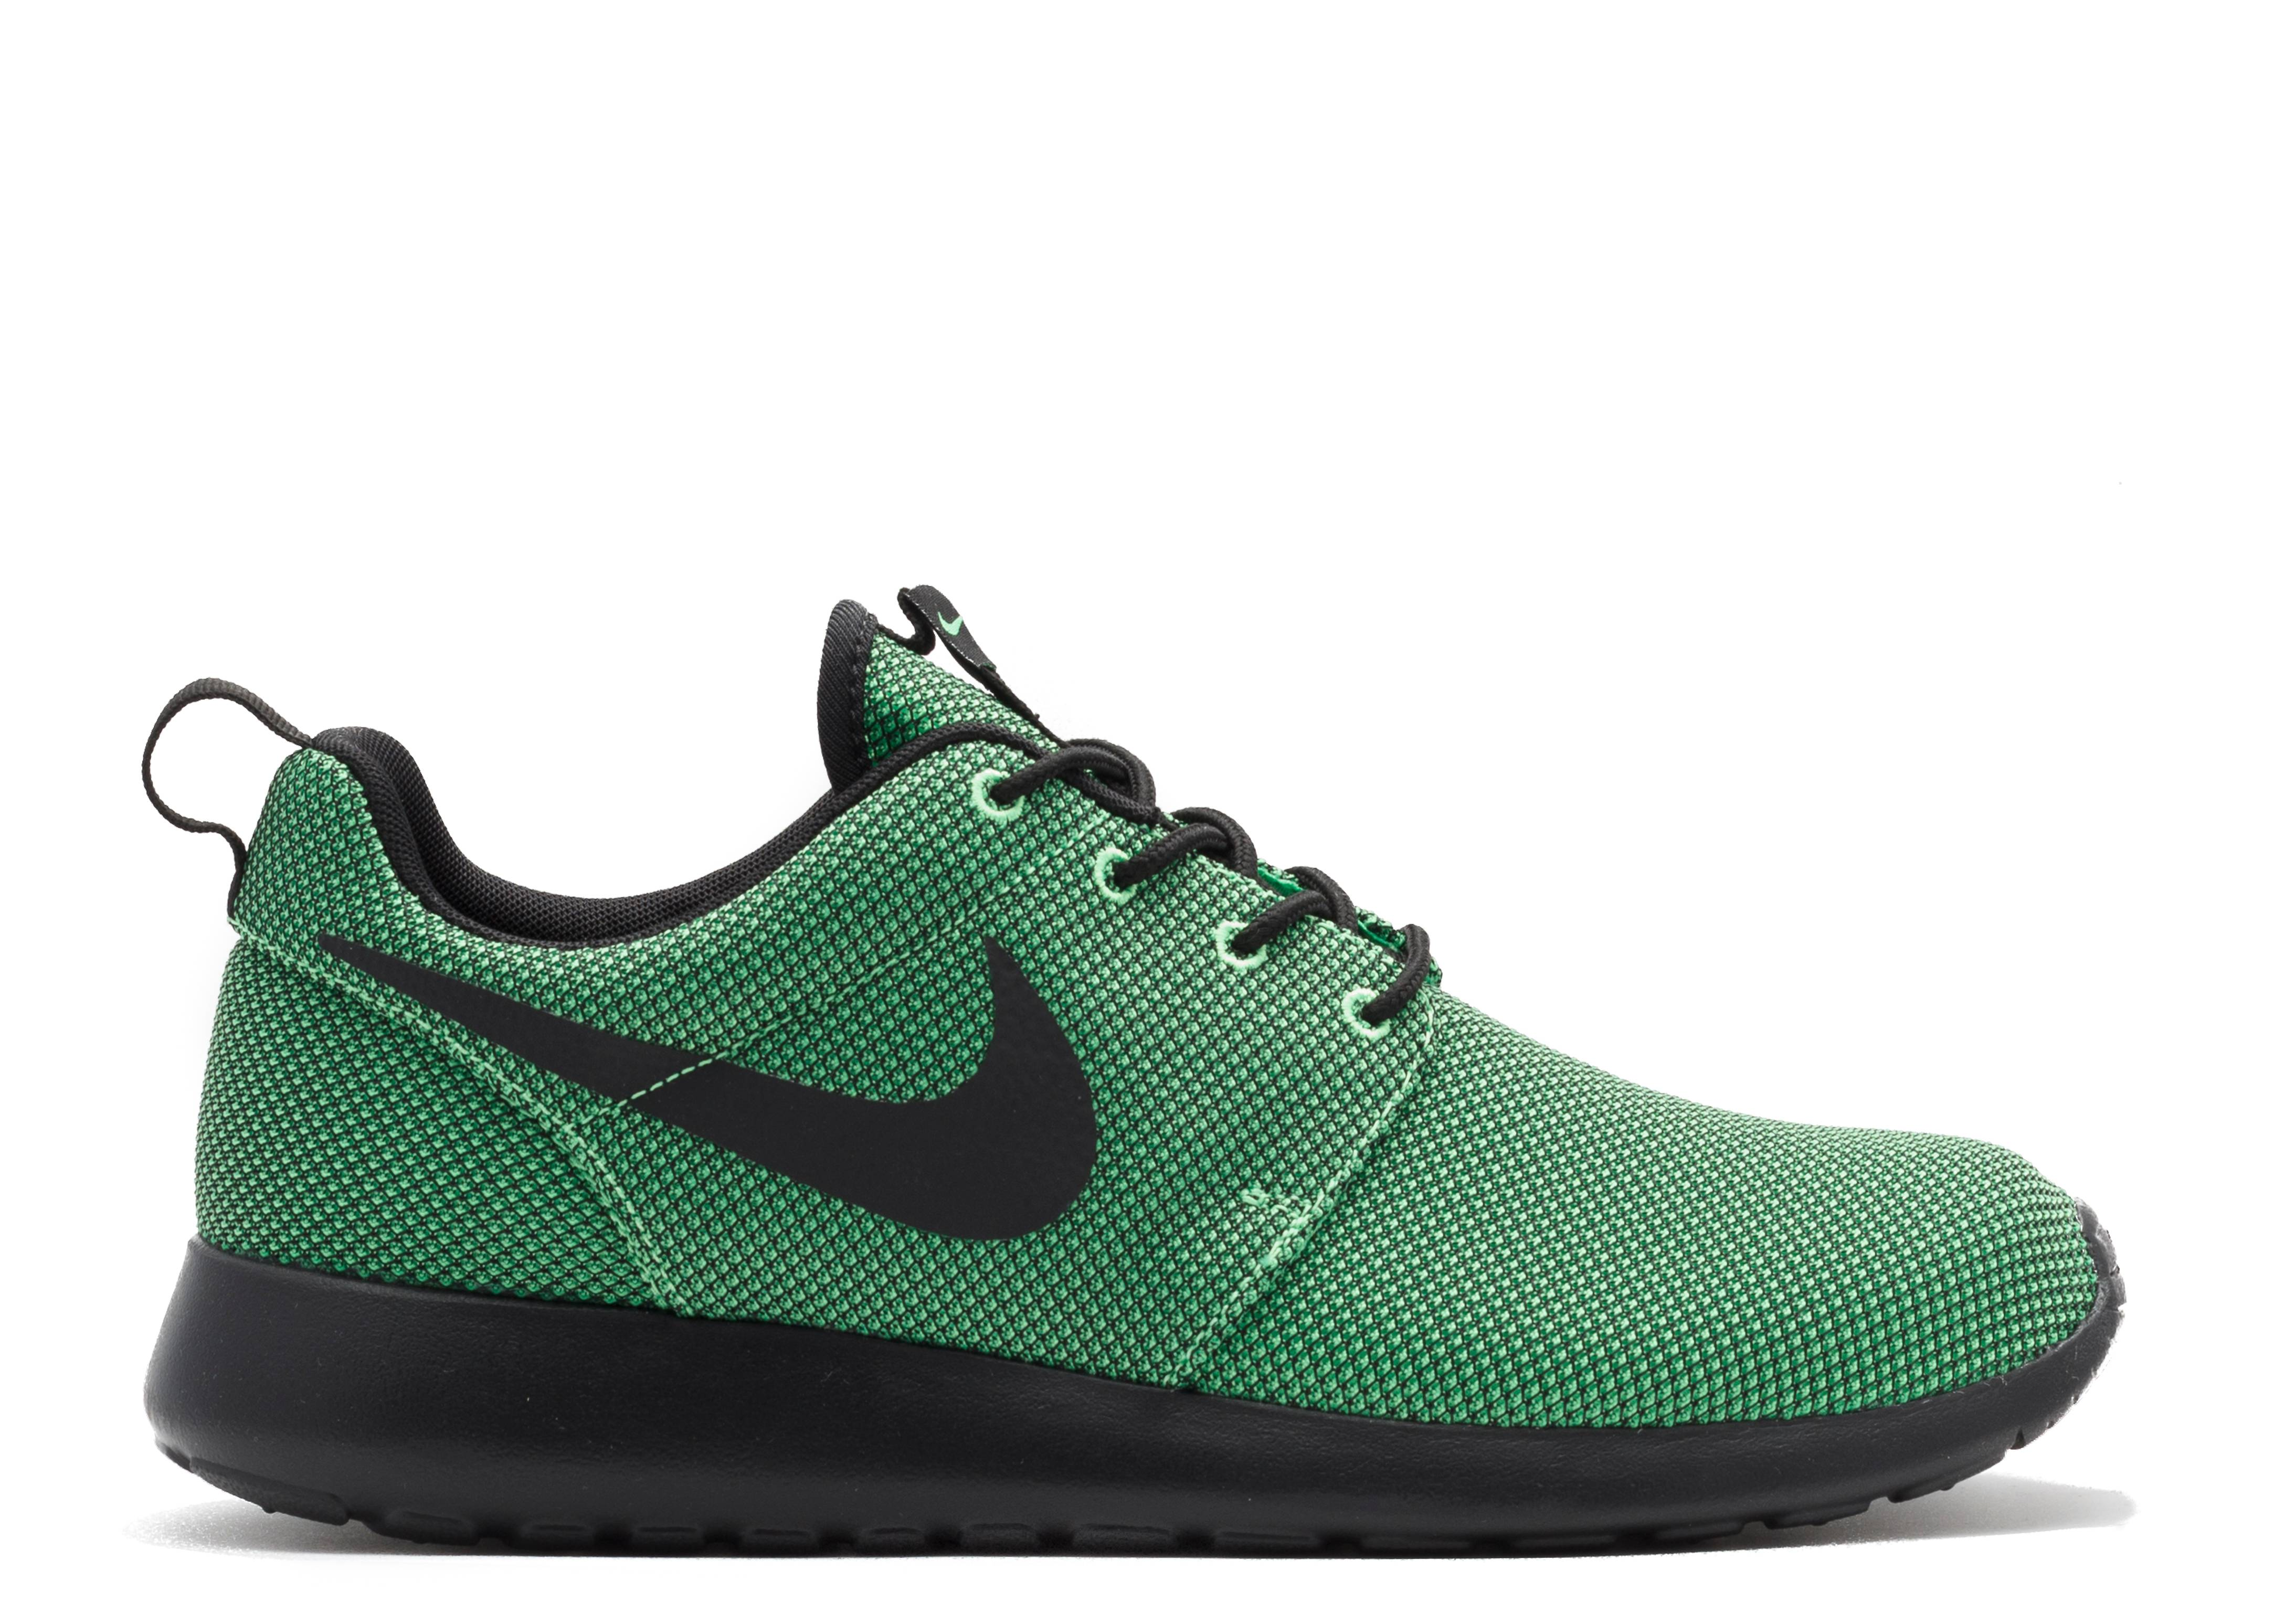 new style 077f9 9dd97 Rosherun - Nike - 511881 304 - poison green black   Flight Club